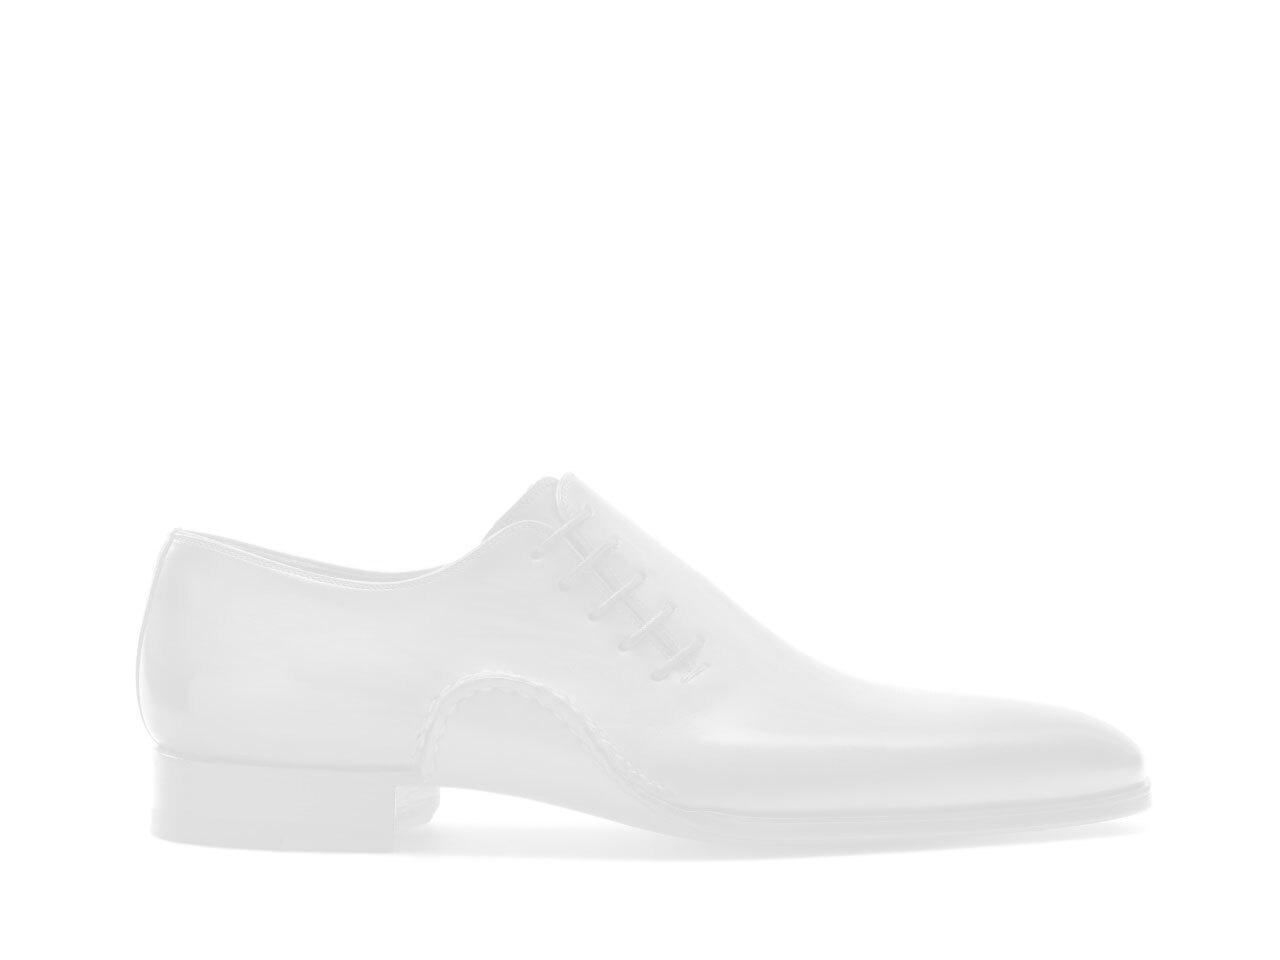 Pair of the Magnanni Siero White Men's Sneakers